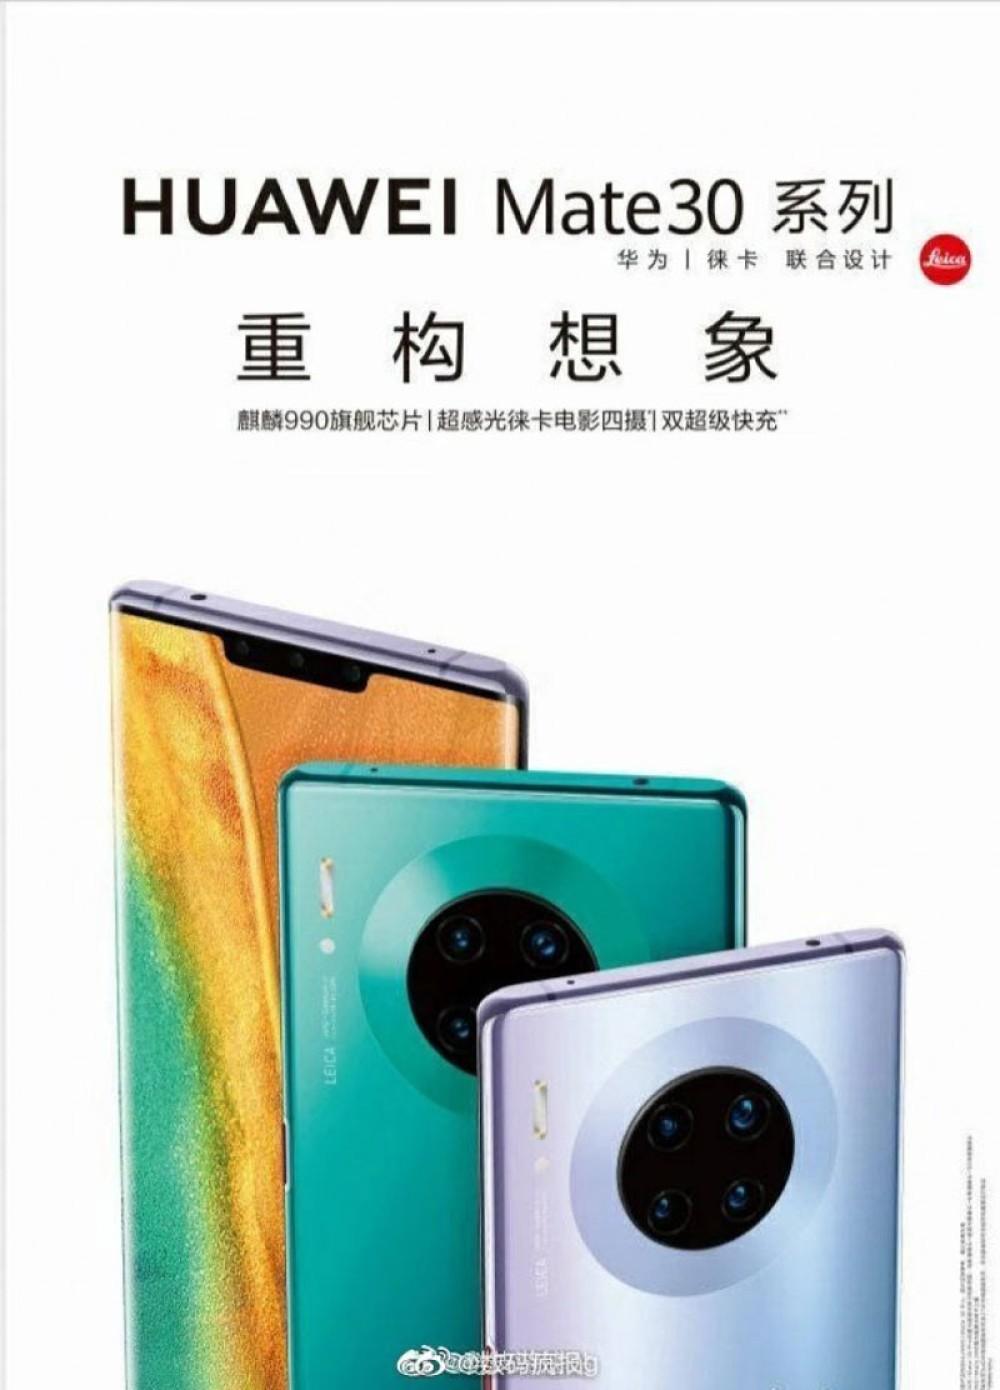 Huawei Mate 30 Pro: Διέρρευσε επίσημη promo εικόνα που αποκαλύπτει την εμφάνιση του